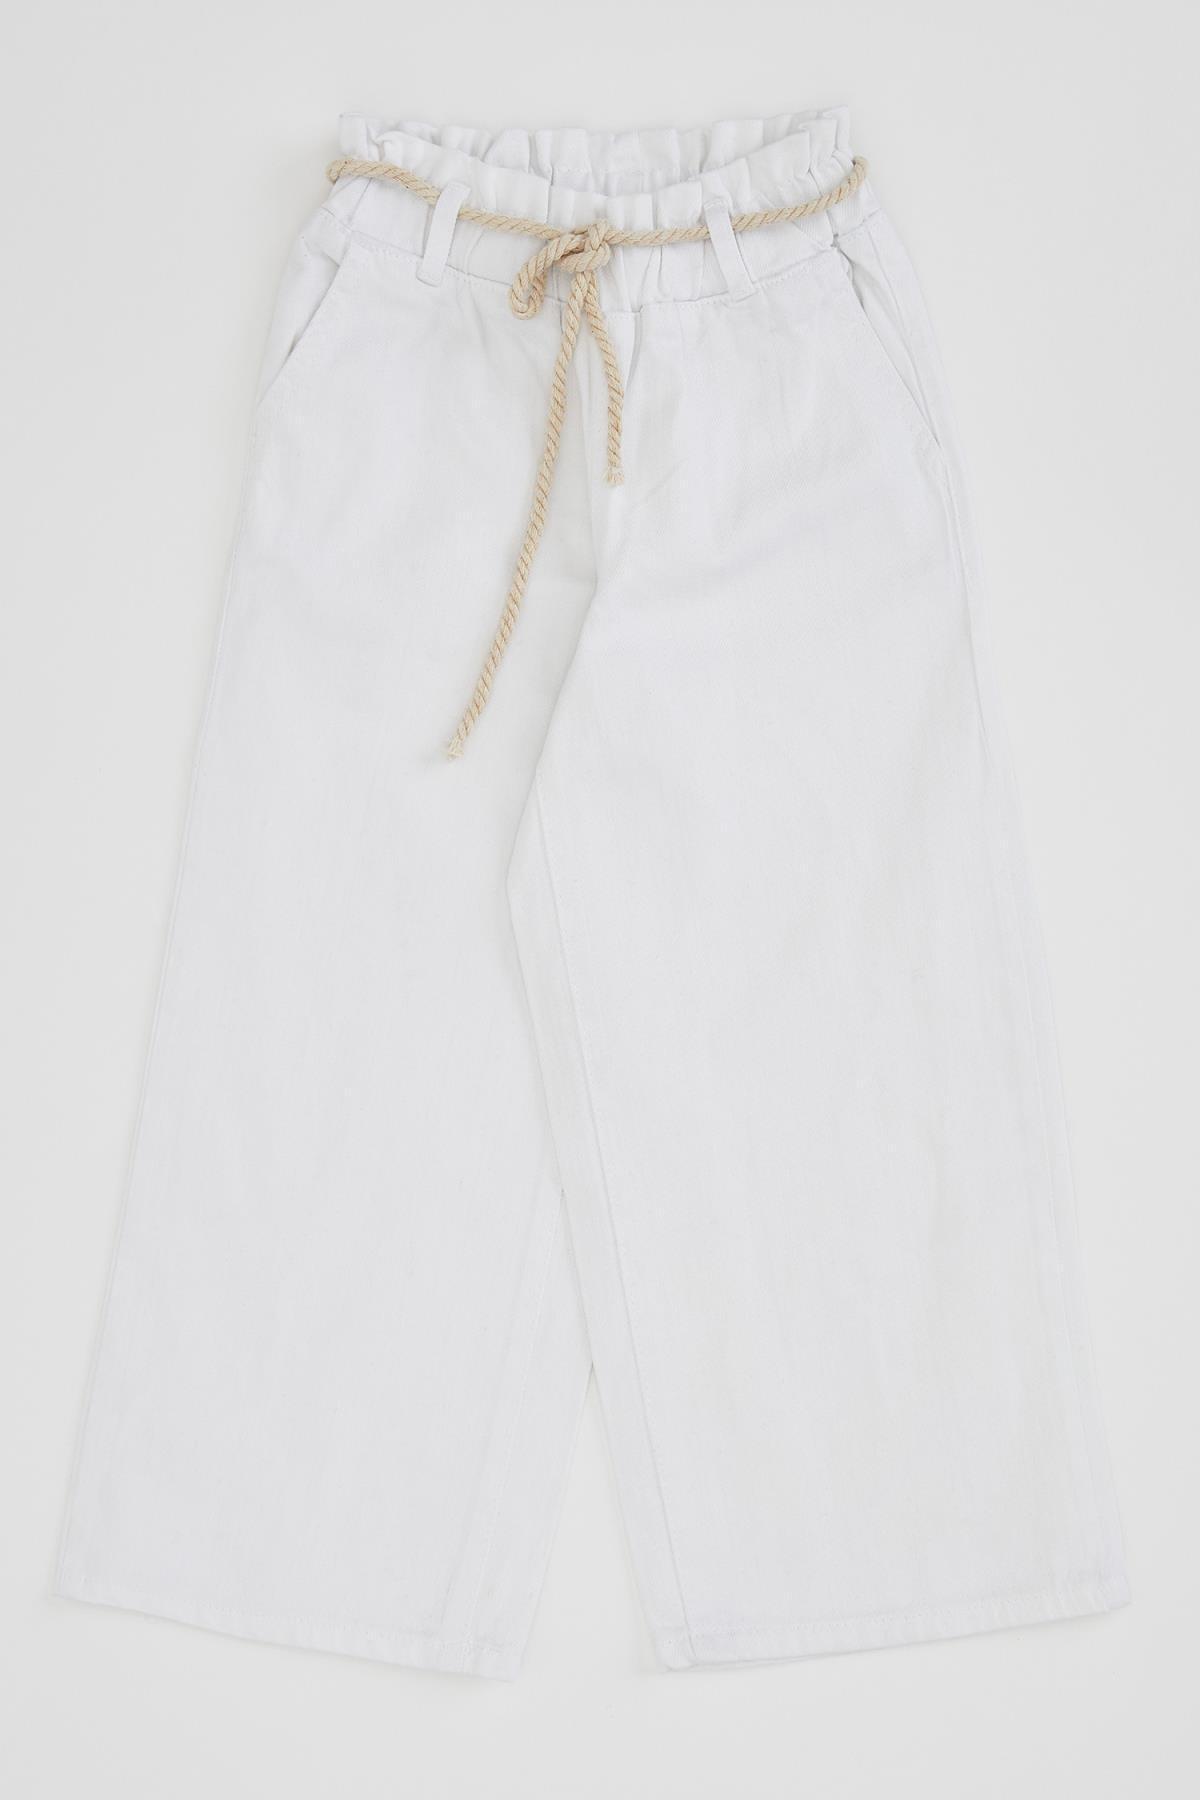 Defacto Kız Çocuk Geniş Paça Beyaz Jean Pantolon 3